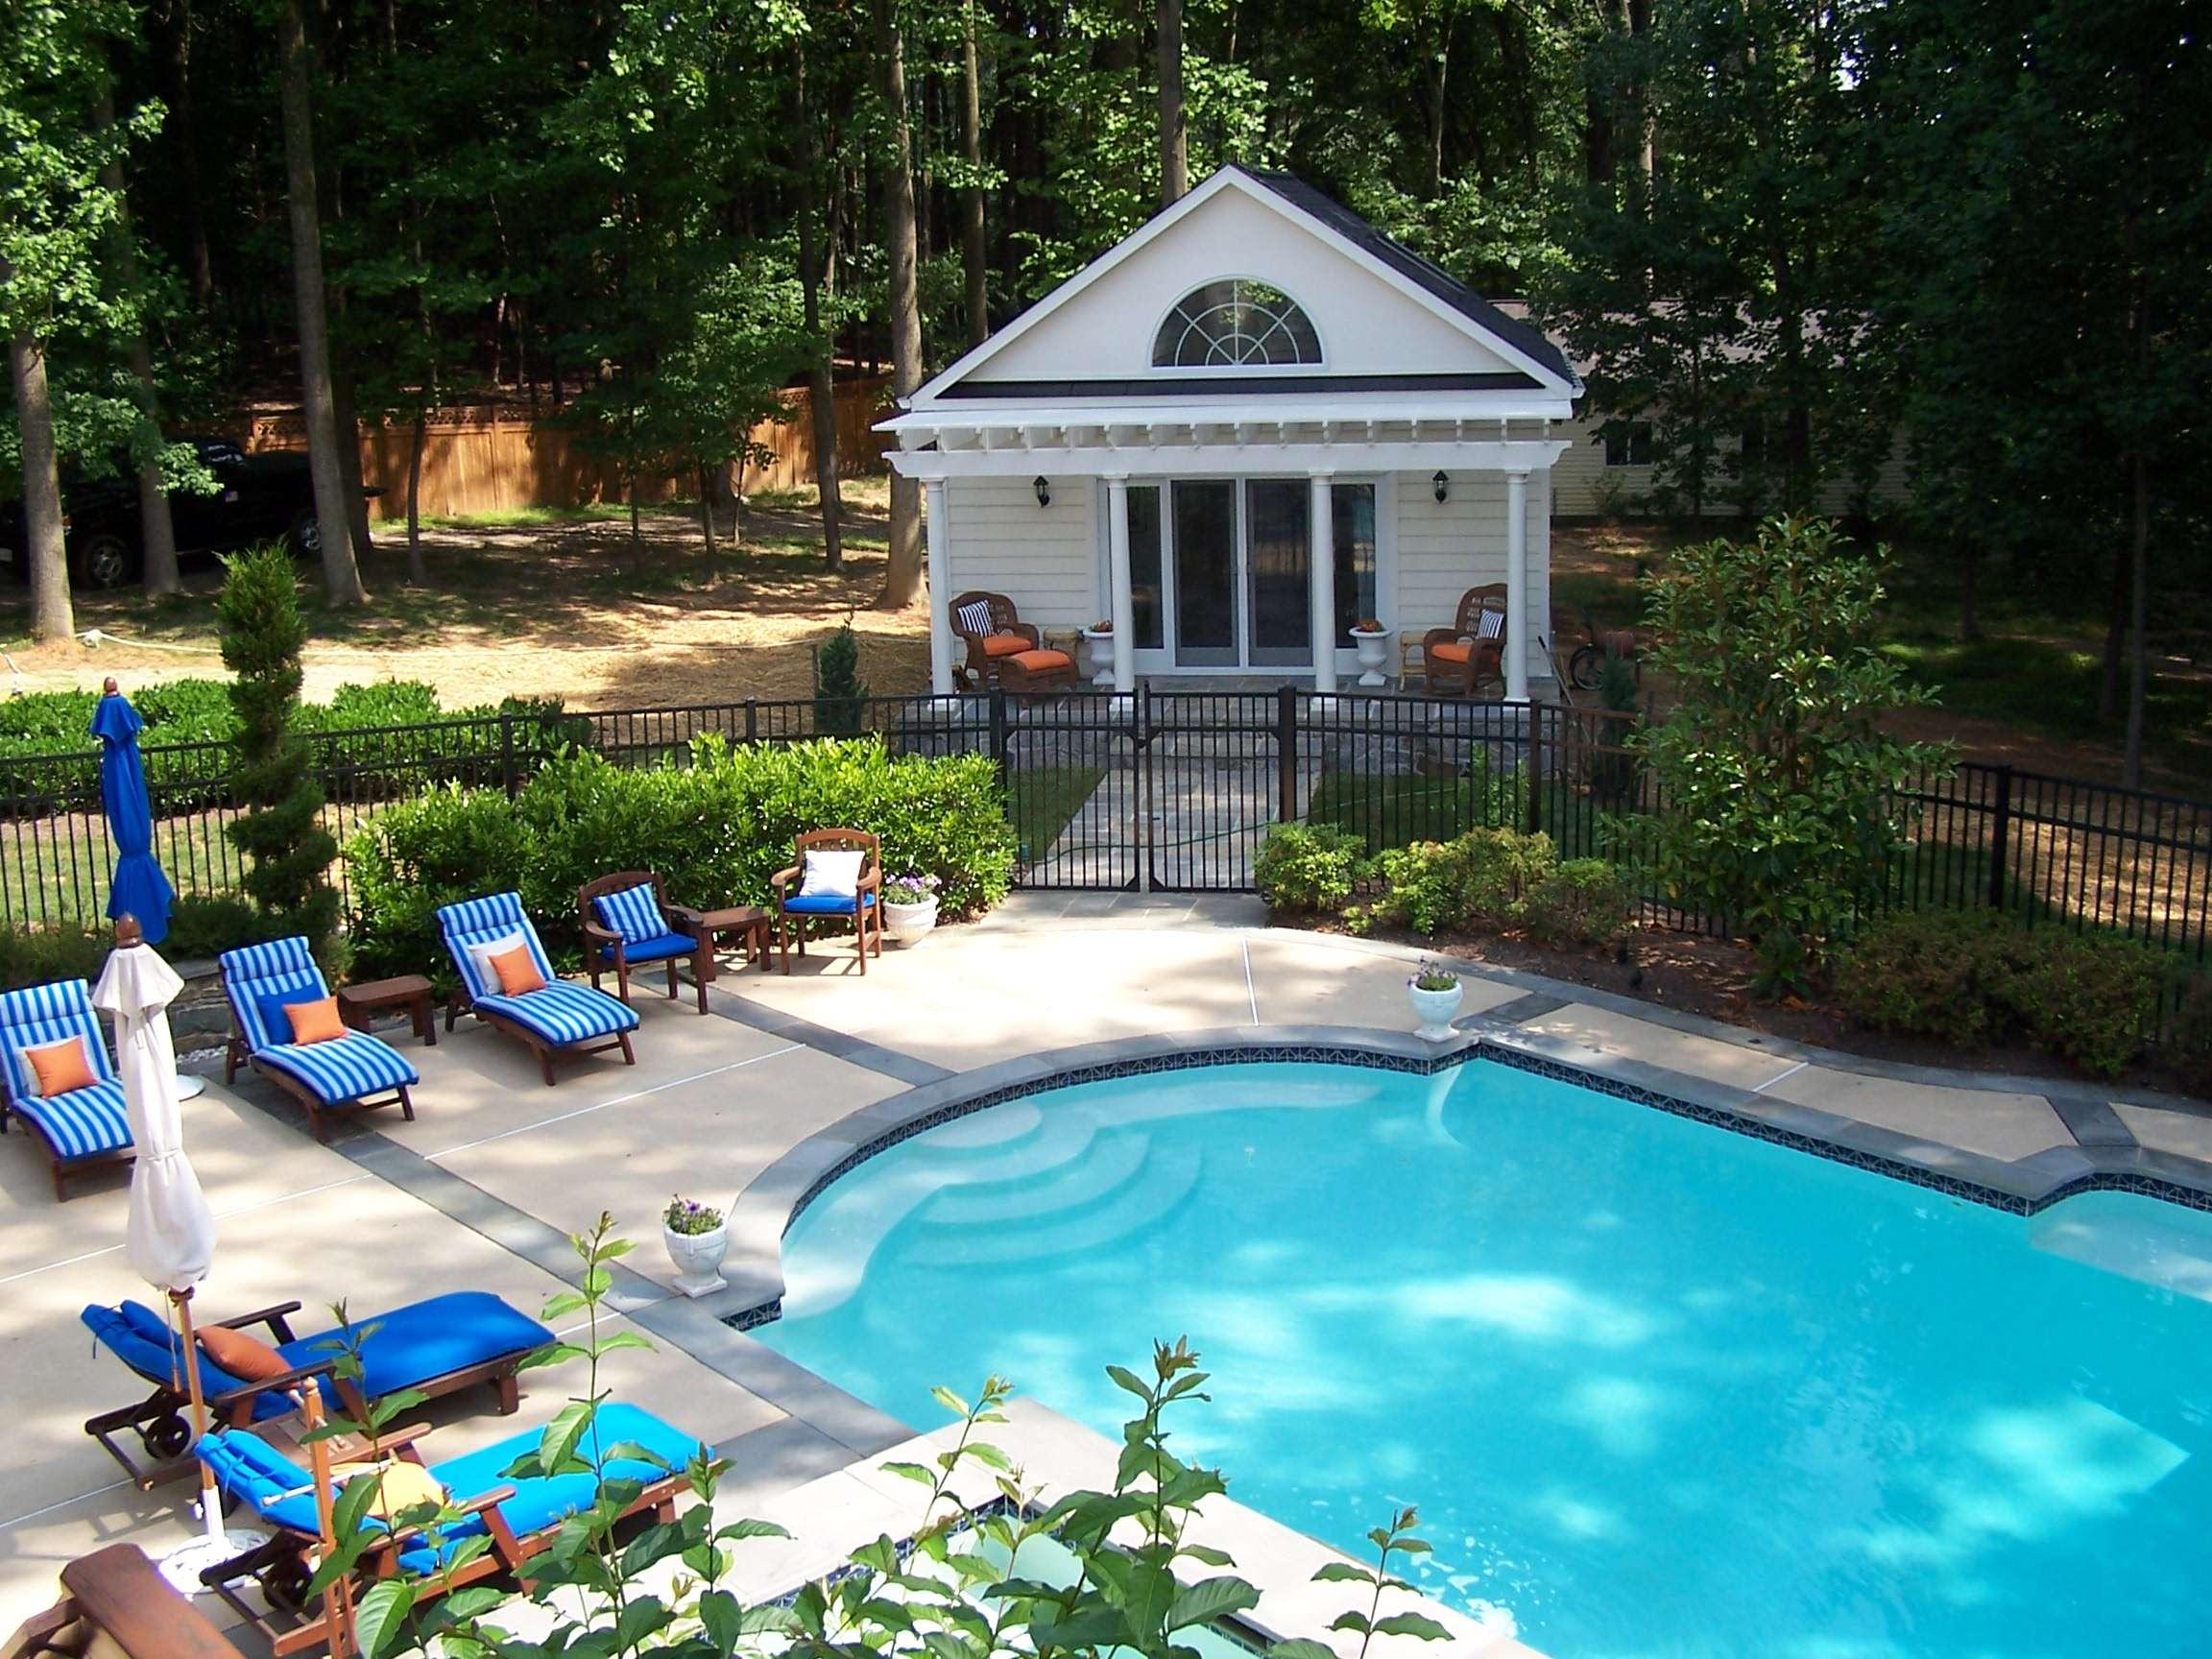 Pool house home addition vienna